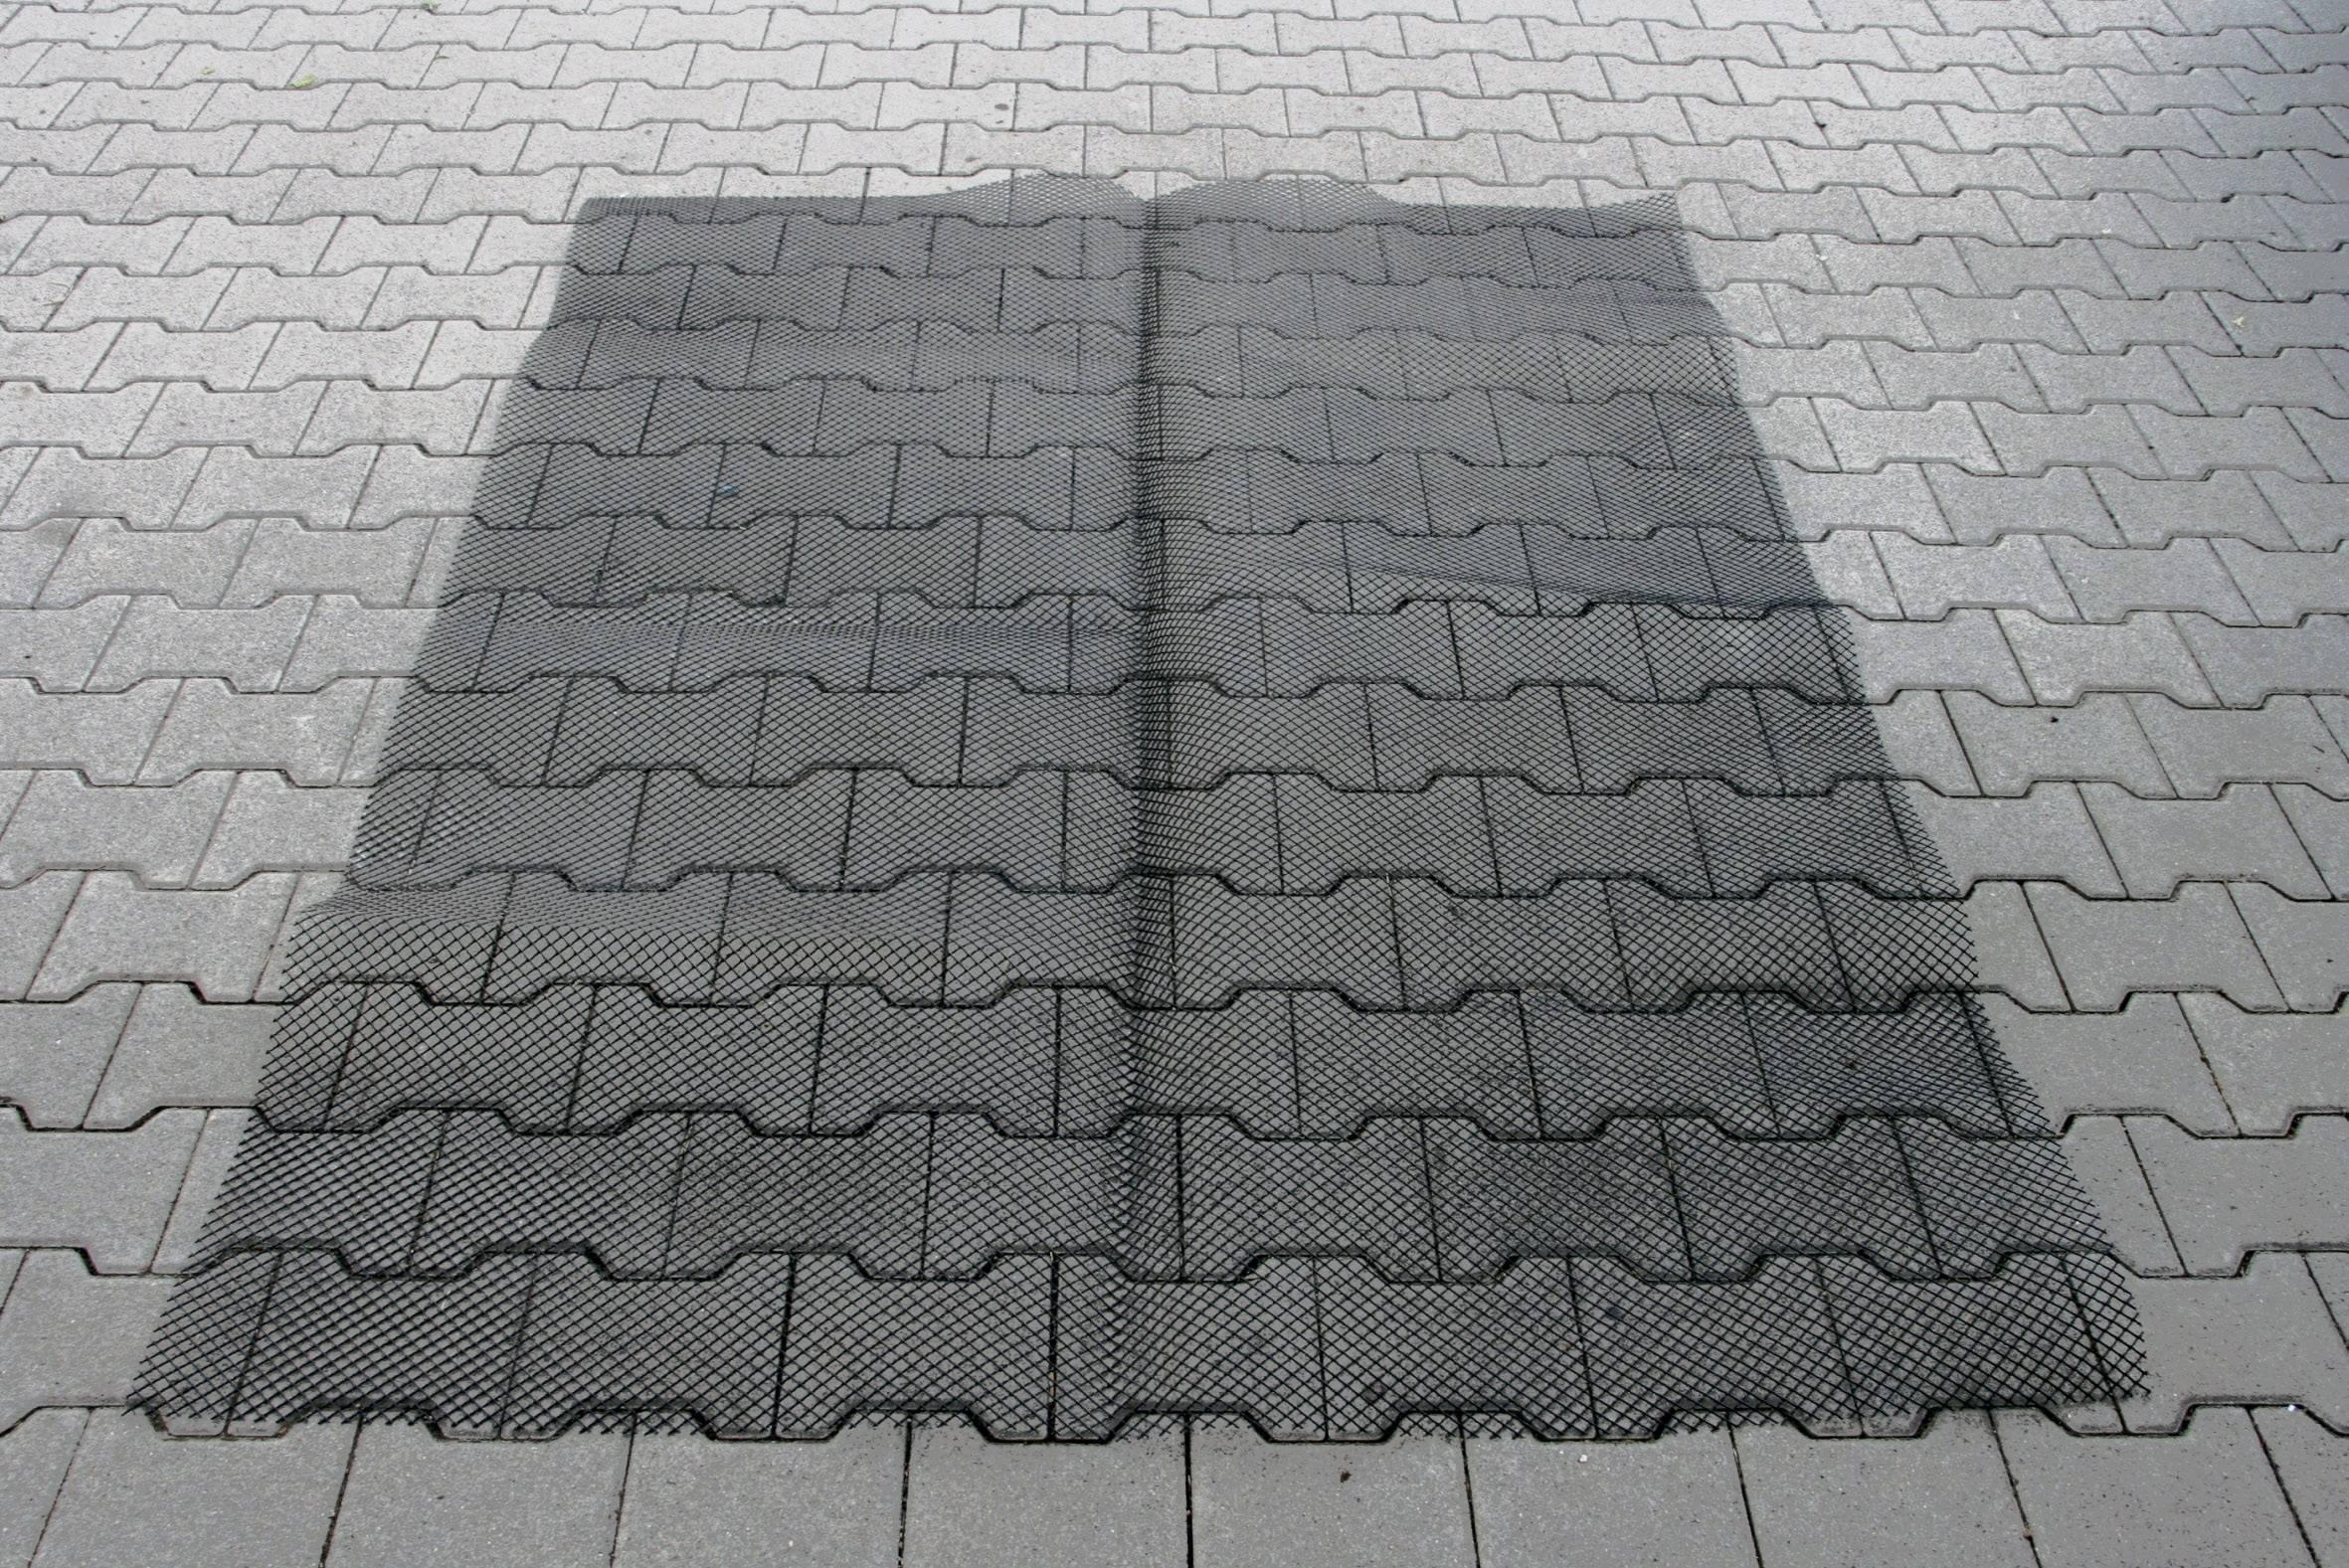 Koberec proti kunám 10108, 190 x 150 cm